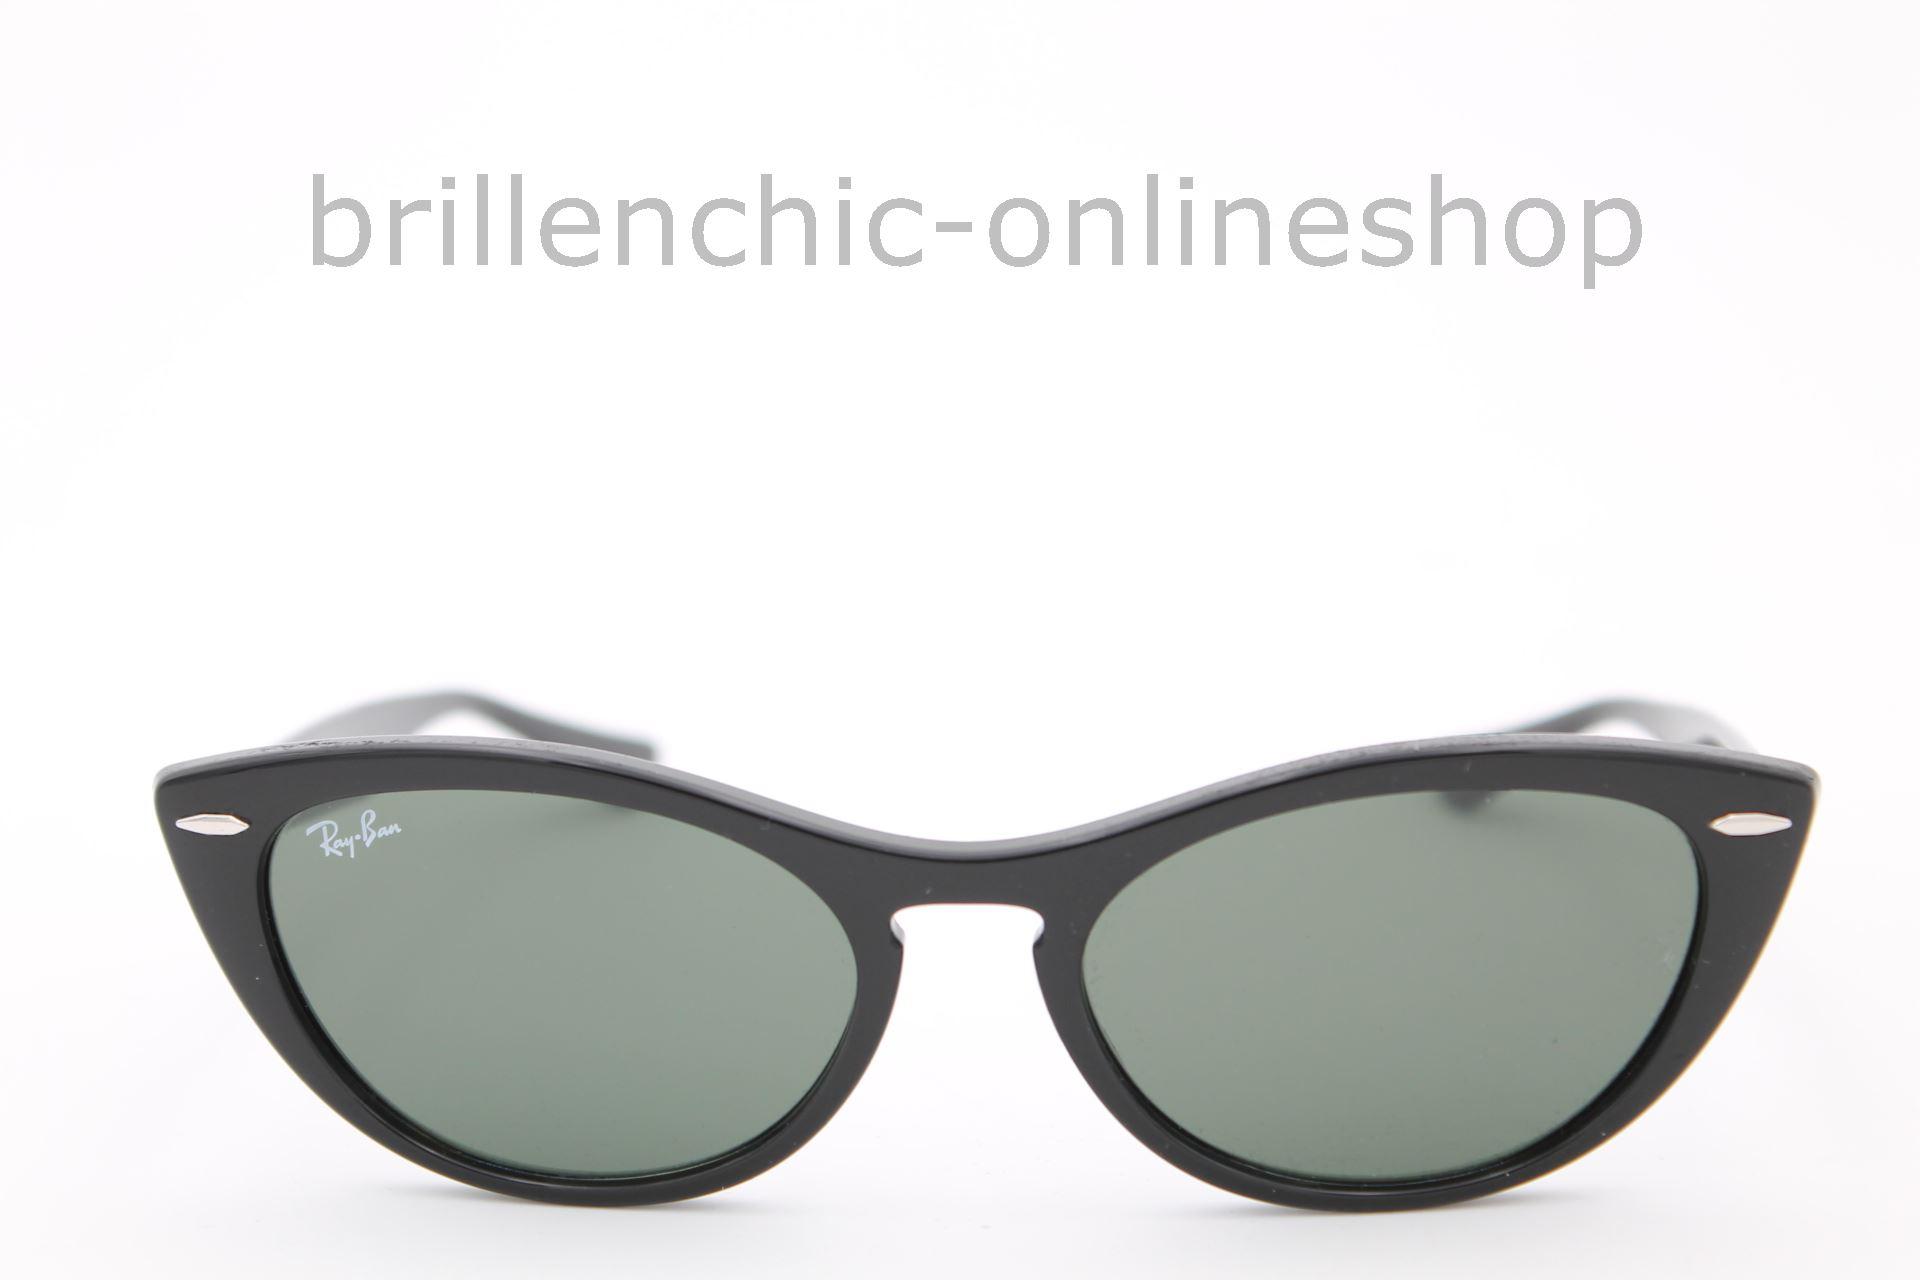 f26257d83b Brillenchic-onlineshop in Berlin - Ray Ban RB 4314N 4314 601 31 NINA ...